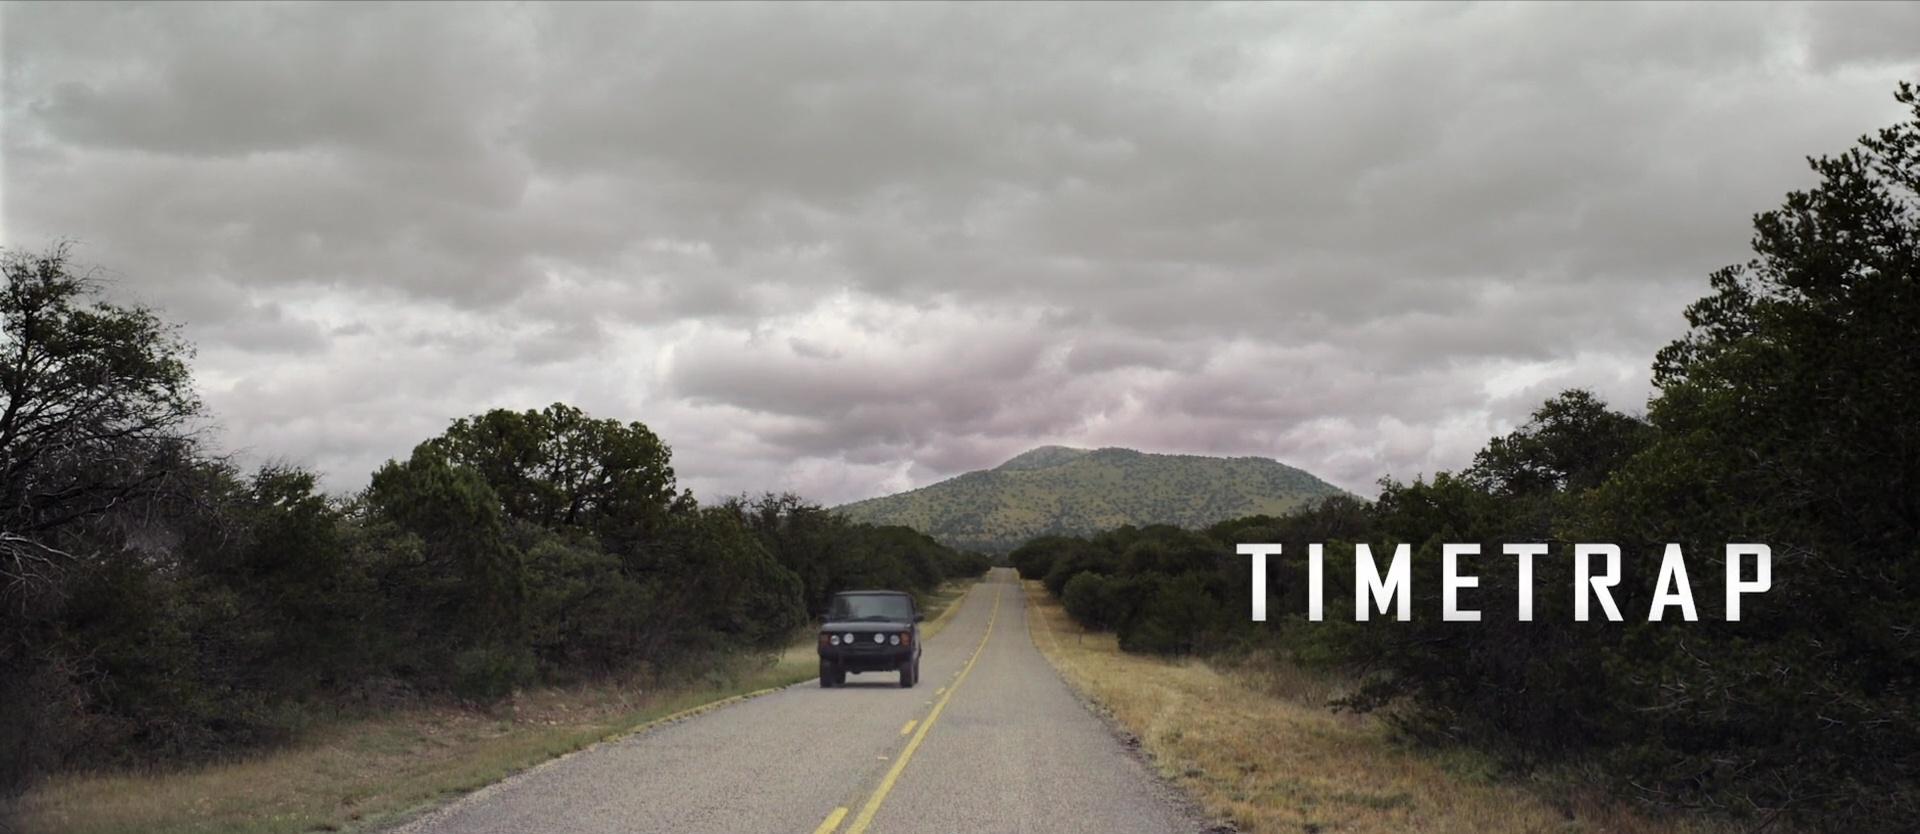 TIME TRAP de Mark Dennis et Ben Foster (2017)